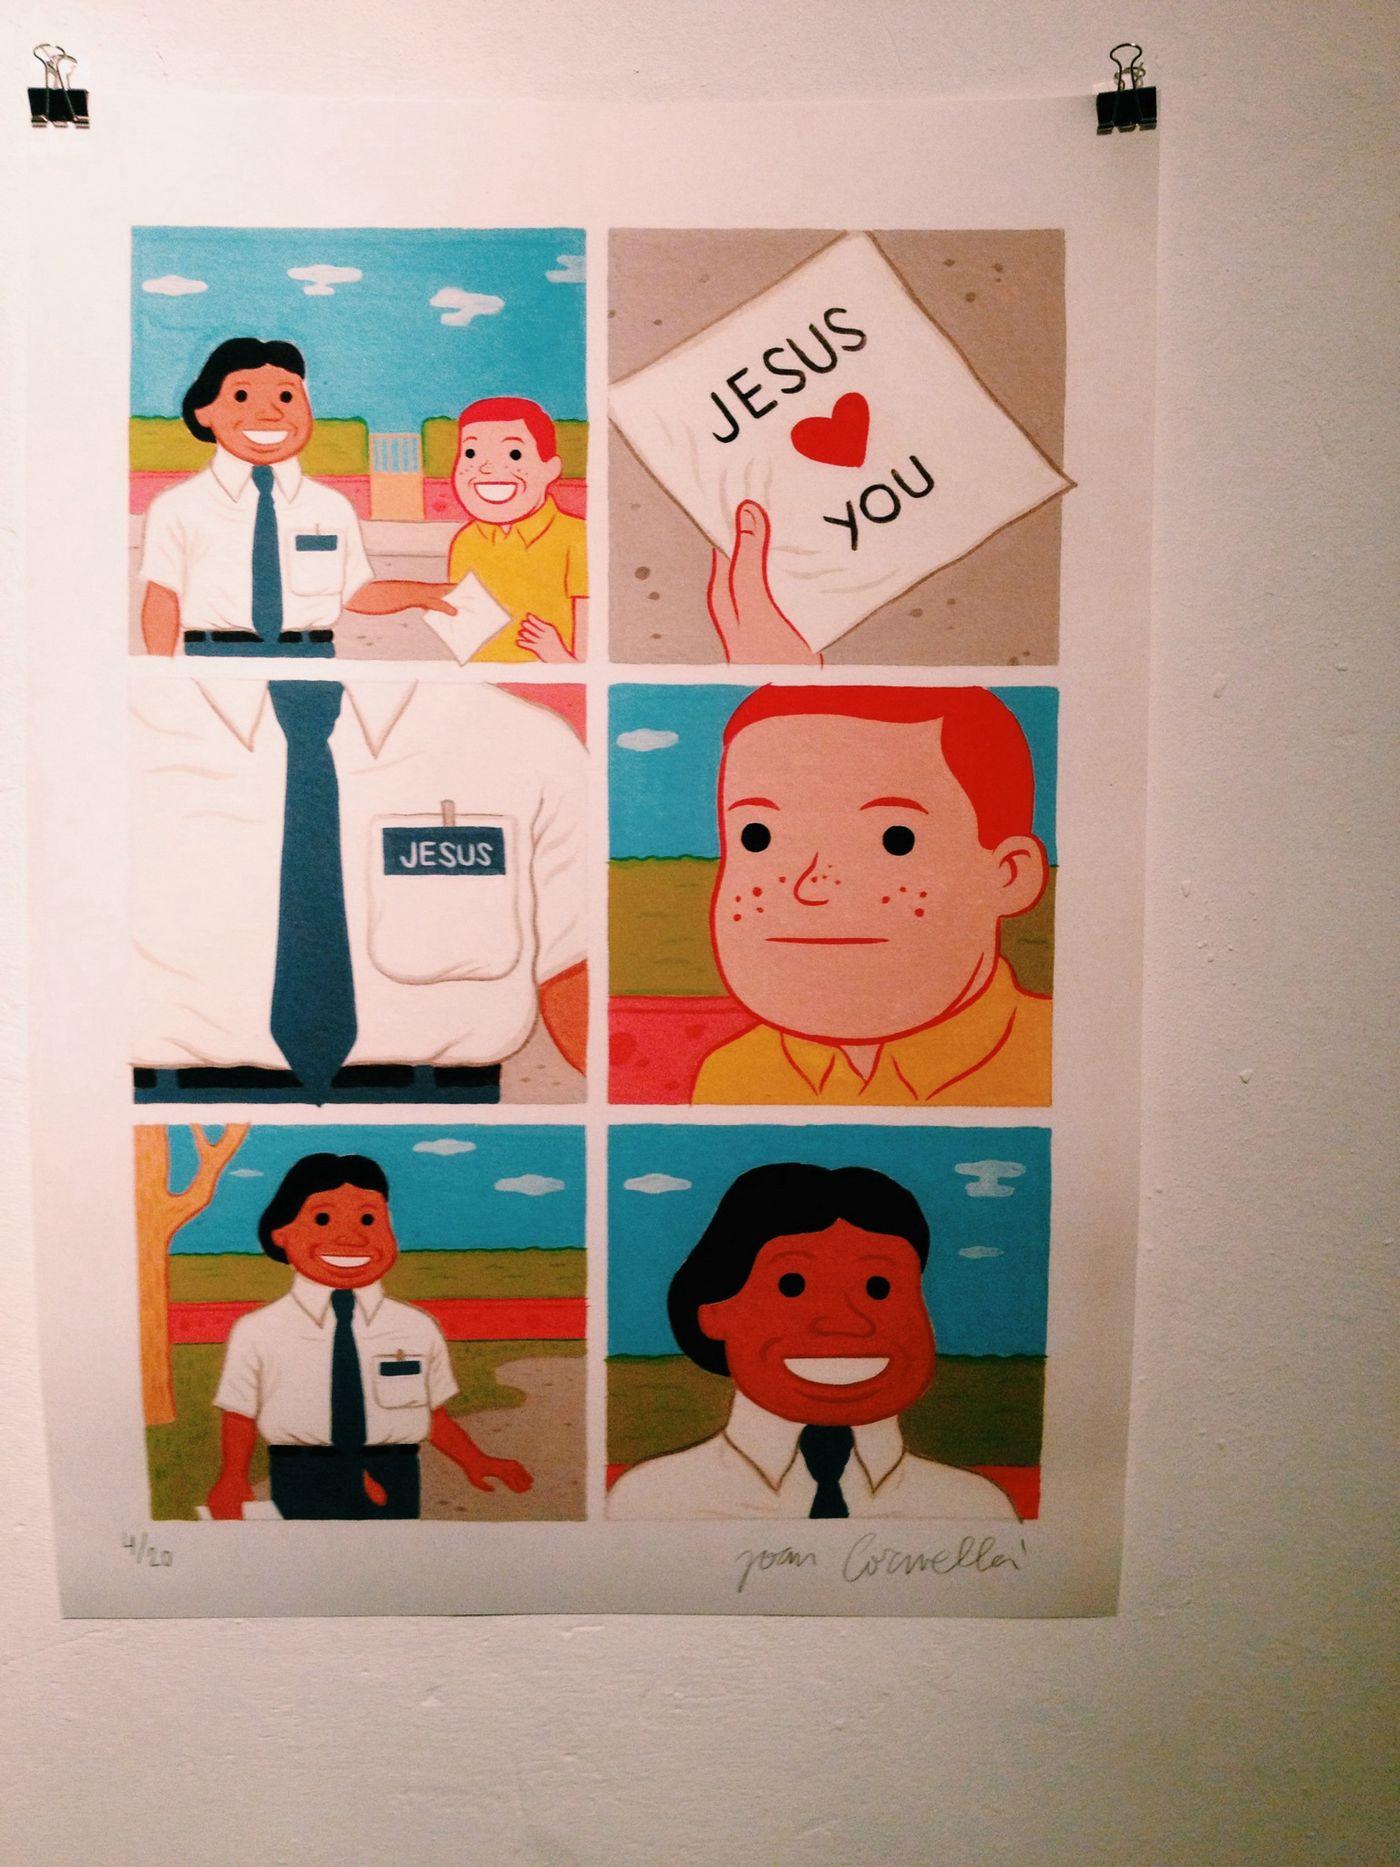 Jesus loves you from Joan Cornella